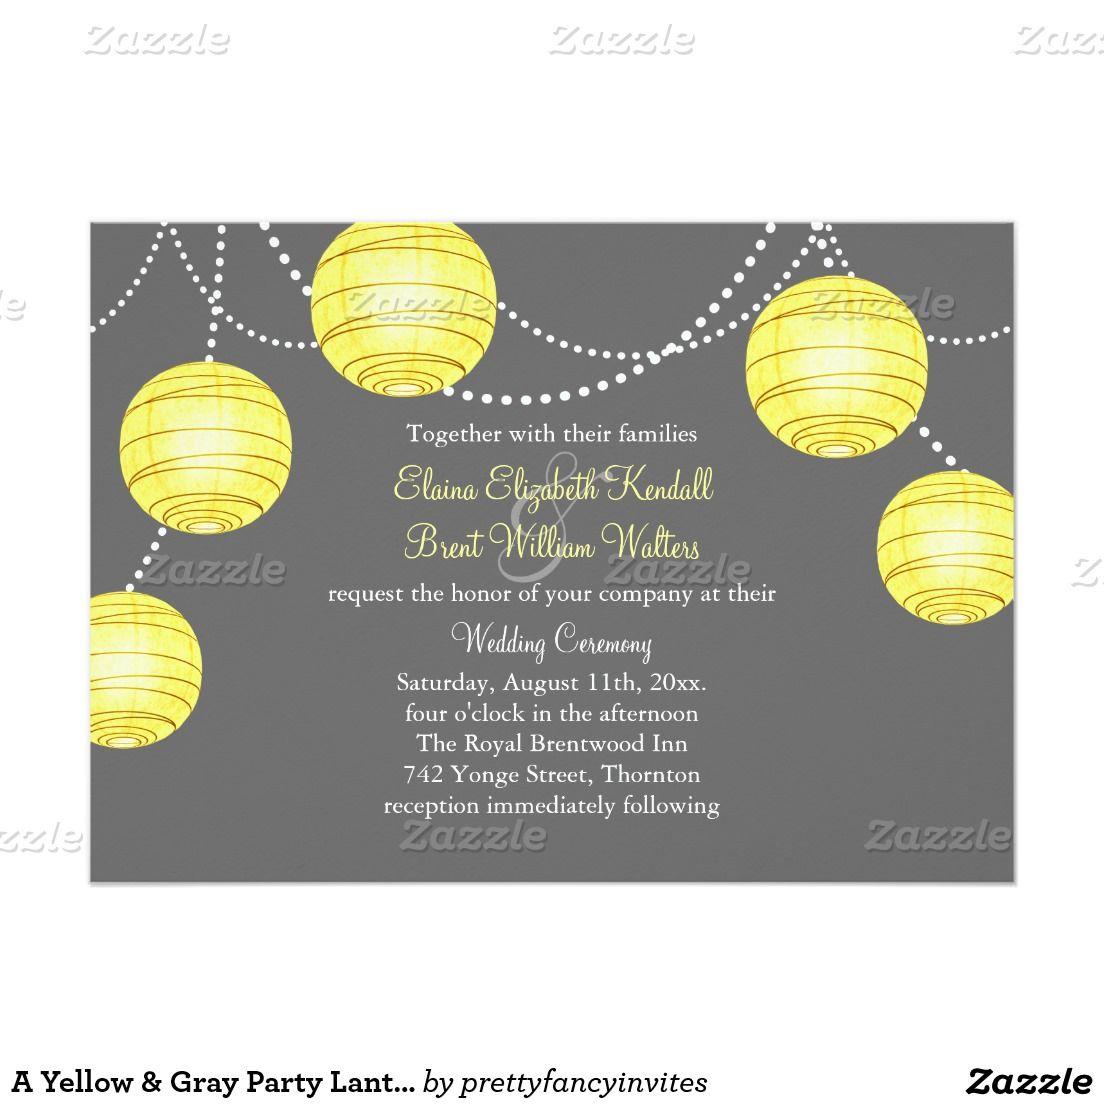 A Yellow & Gray Party Lanterns Wedding Invitation